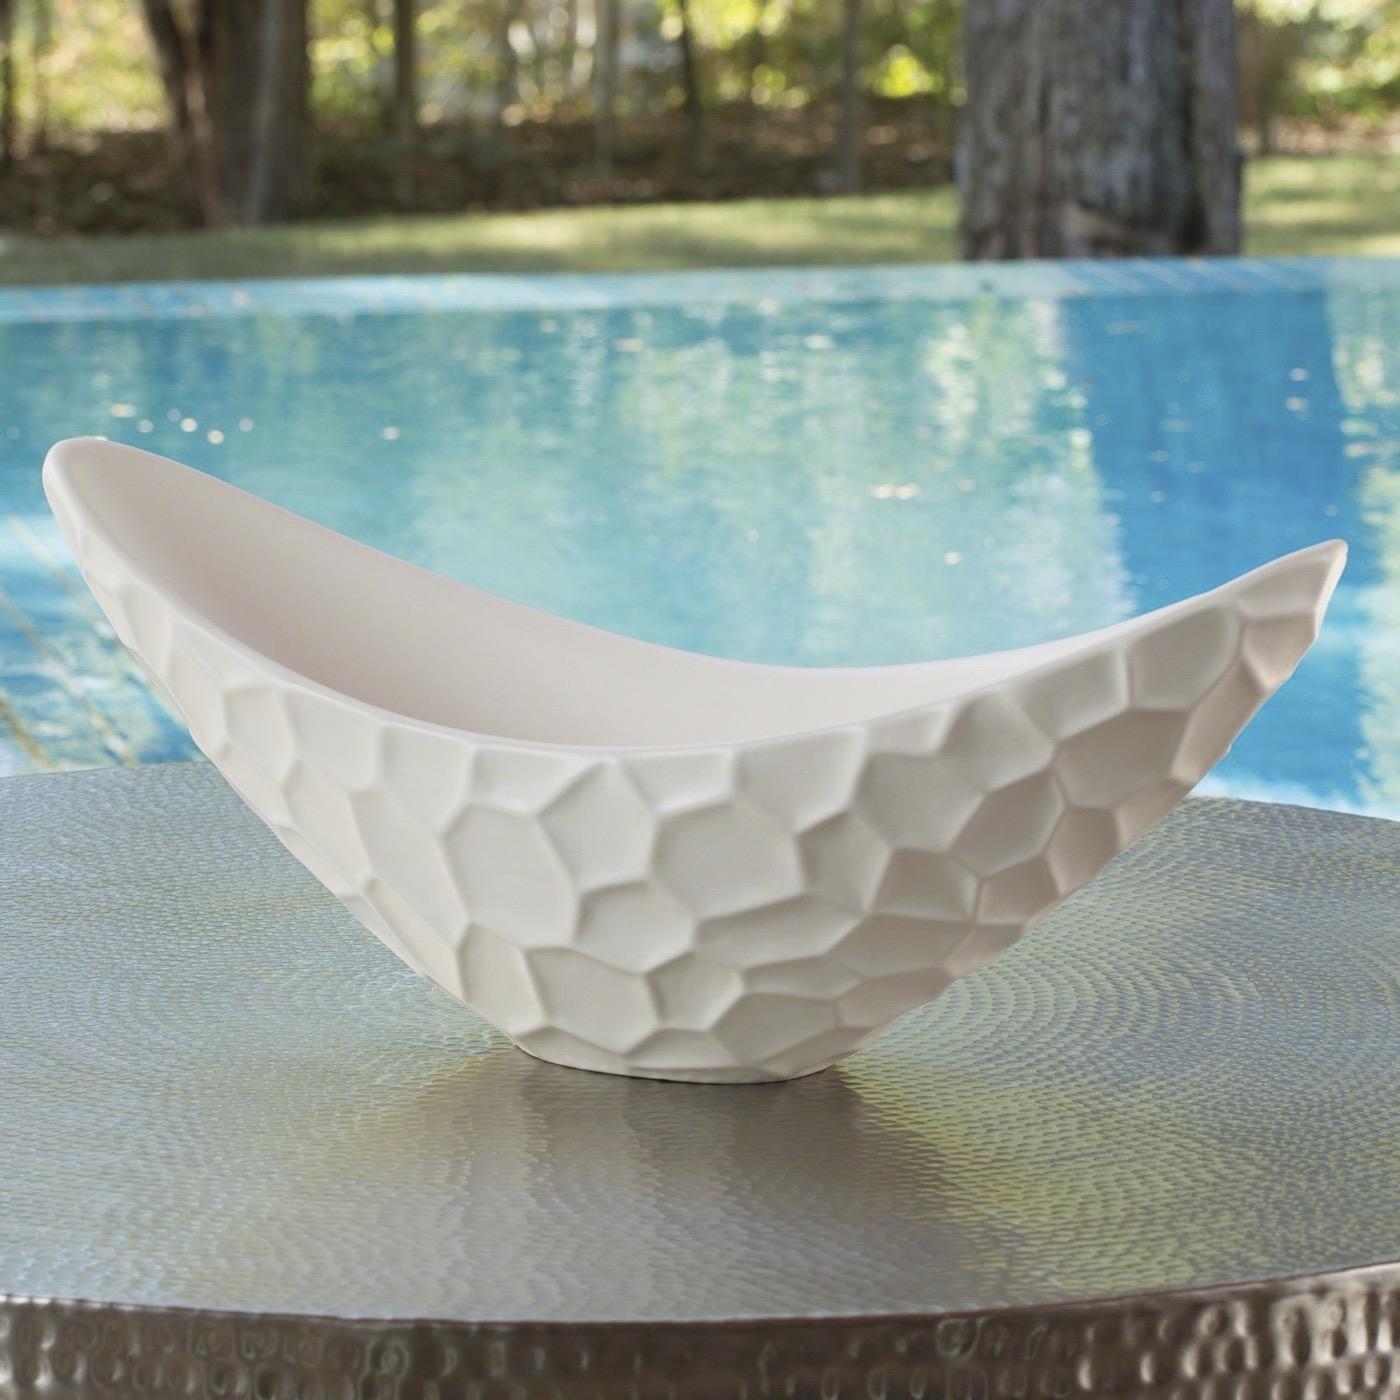 Waxley Ceramic Bowl